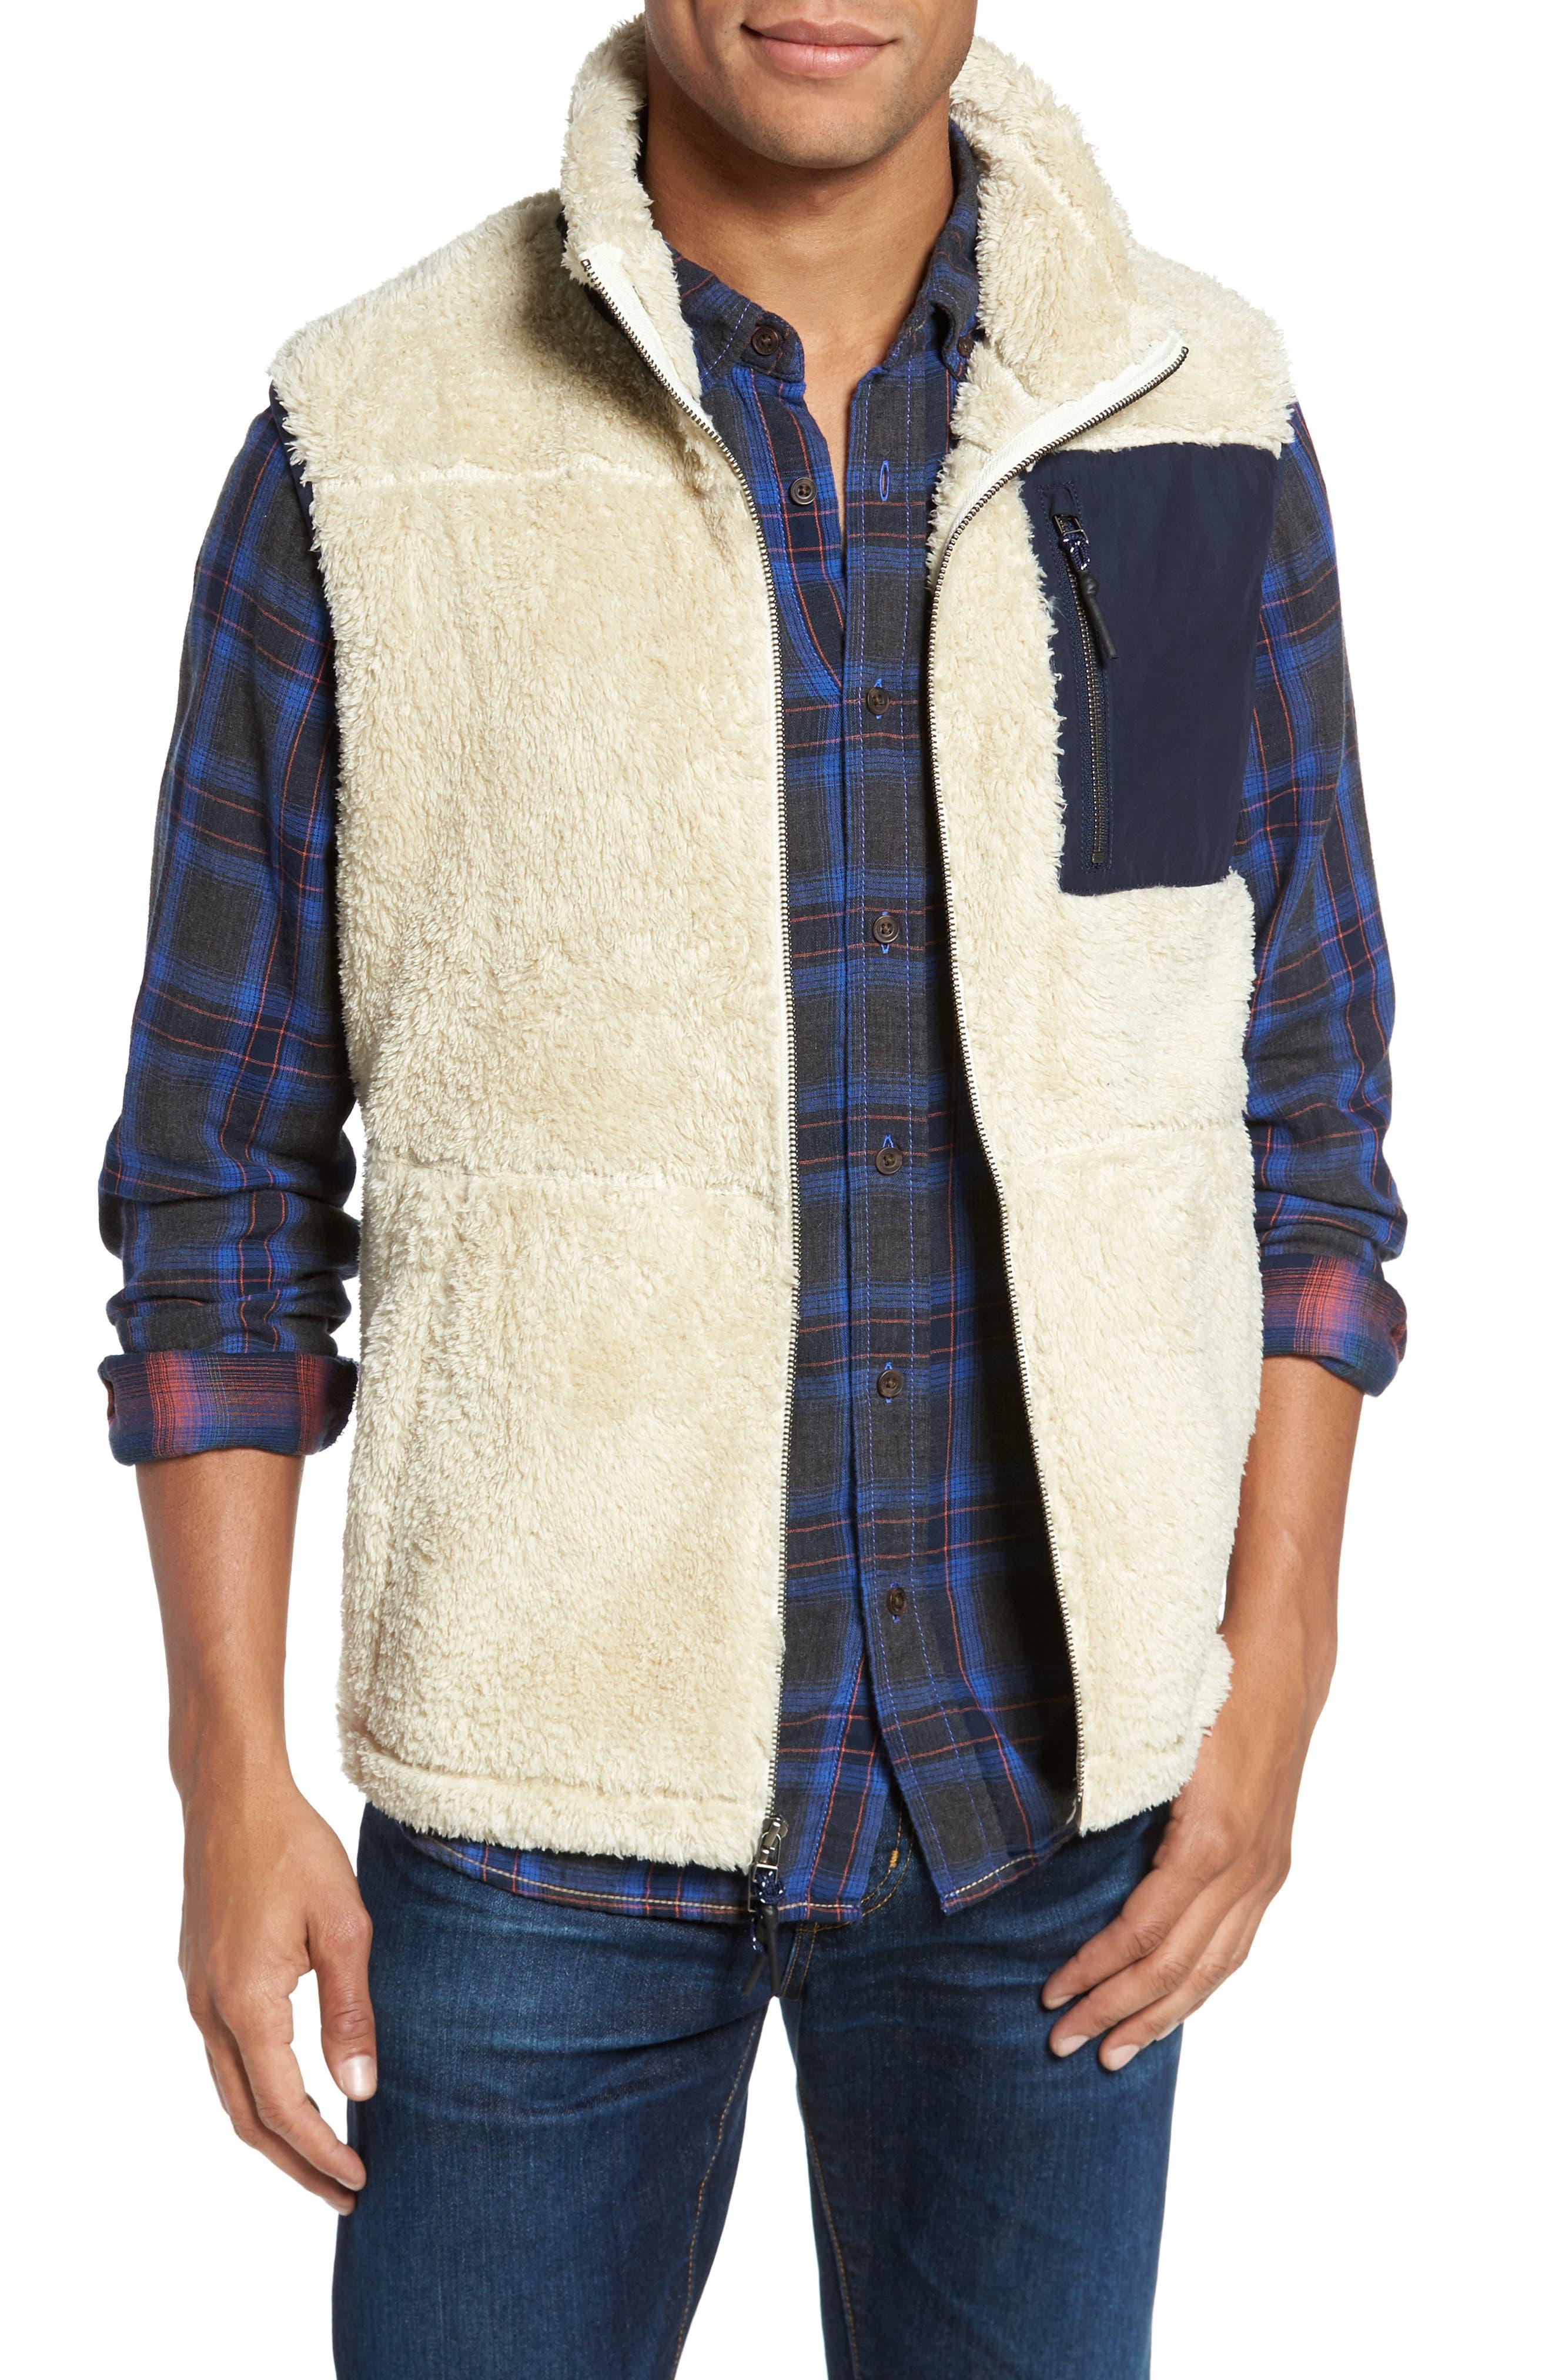 Surfside Supply Colorblock Fleece Vest